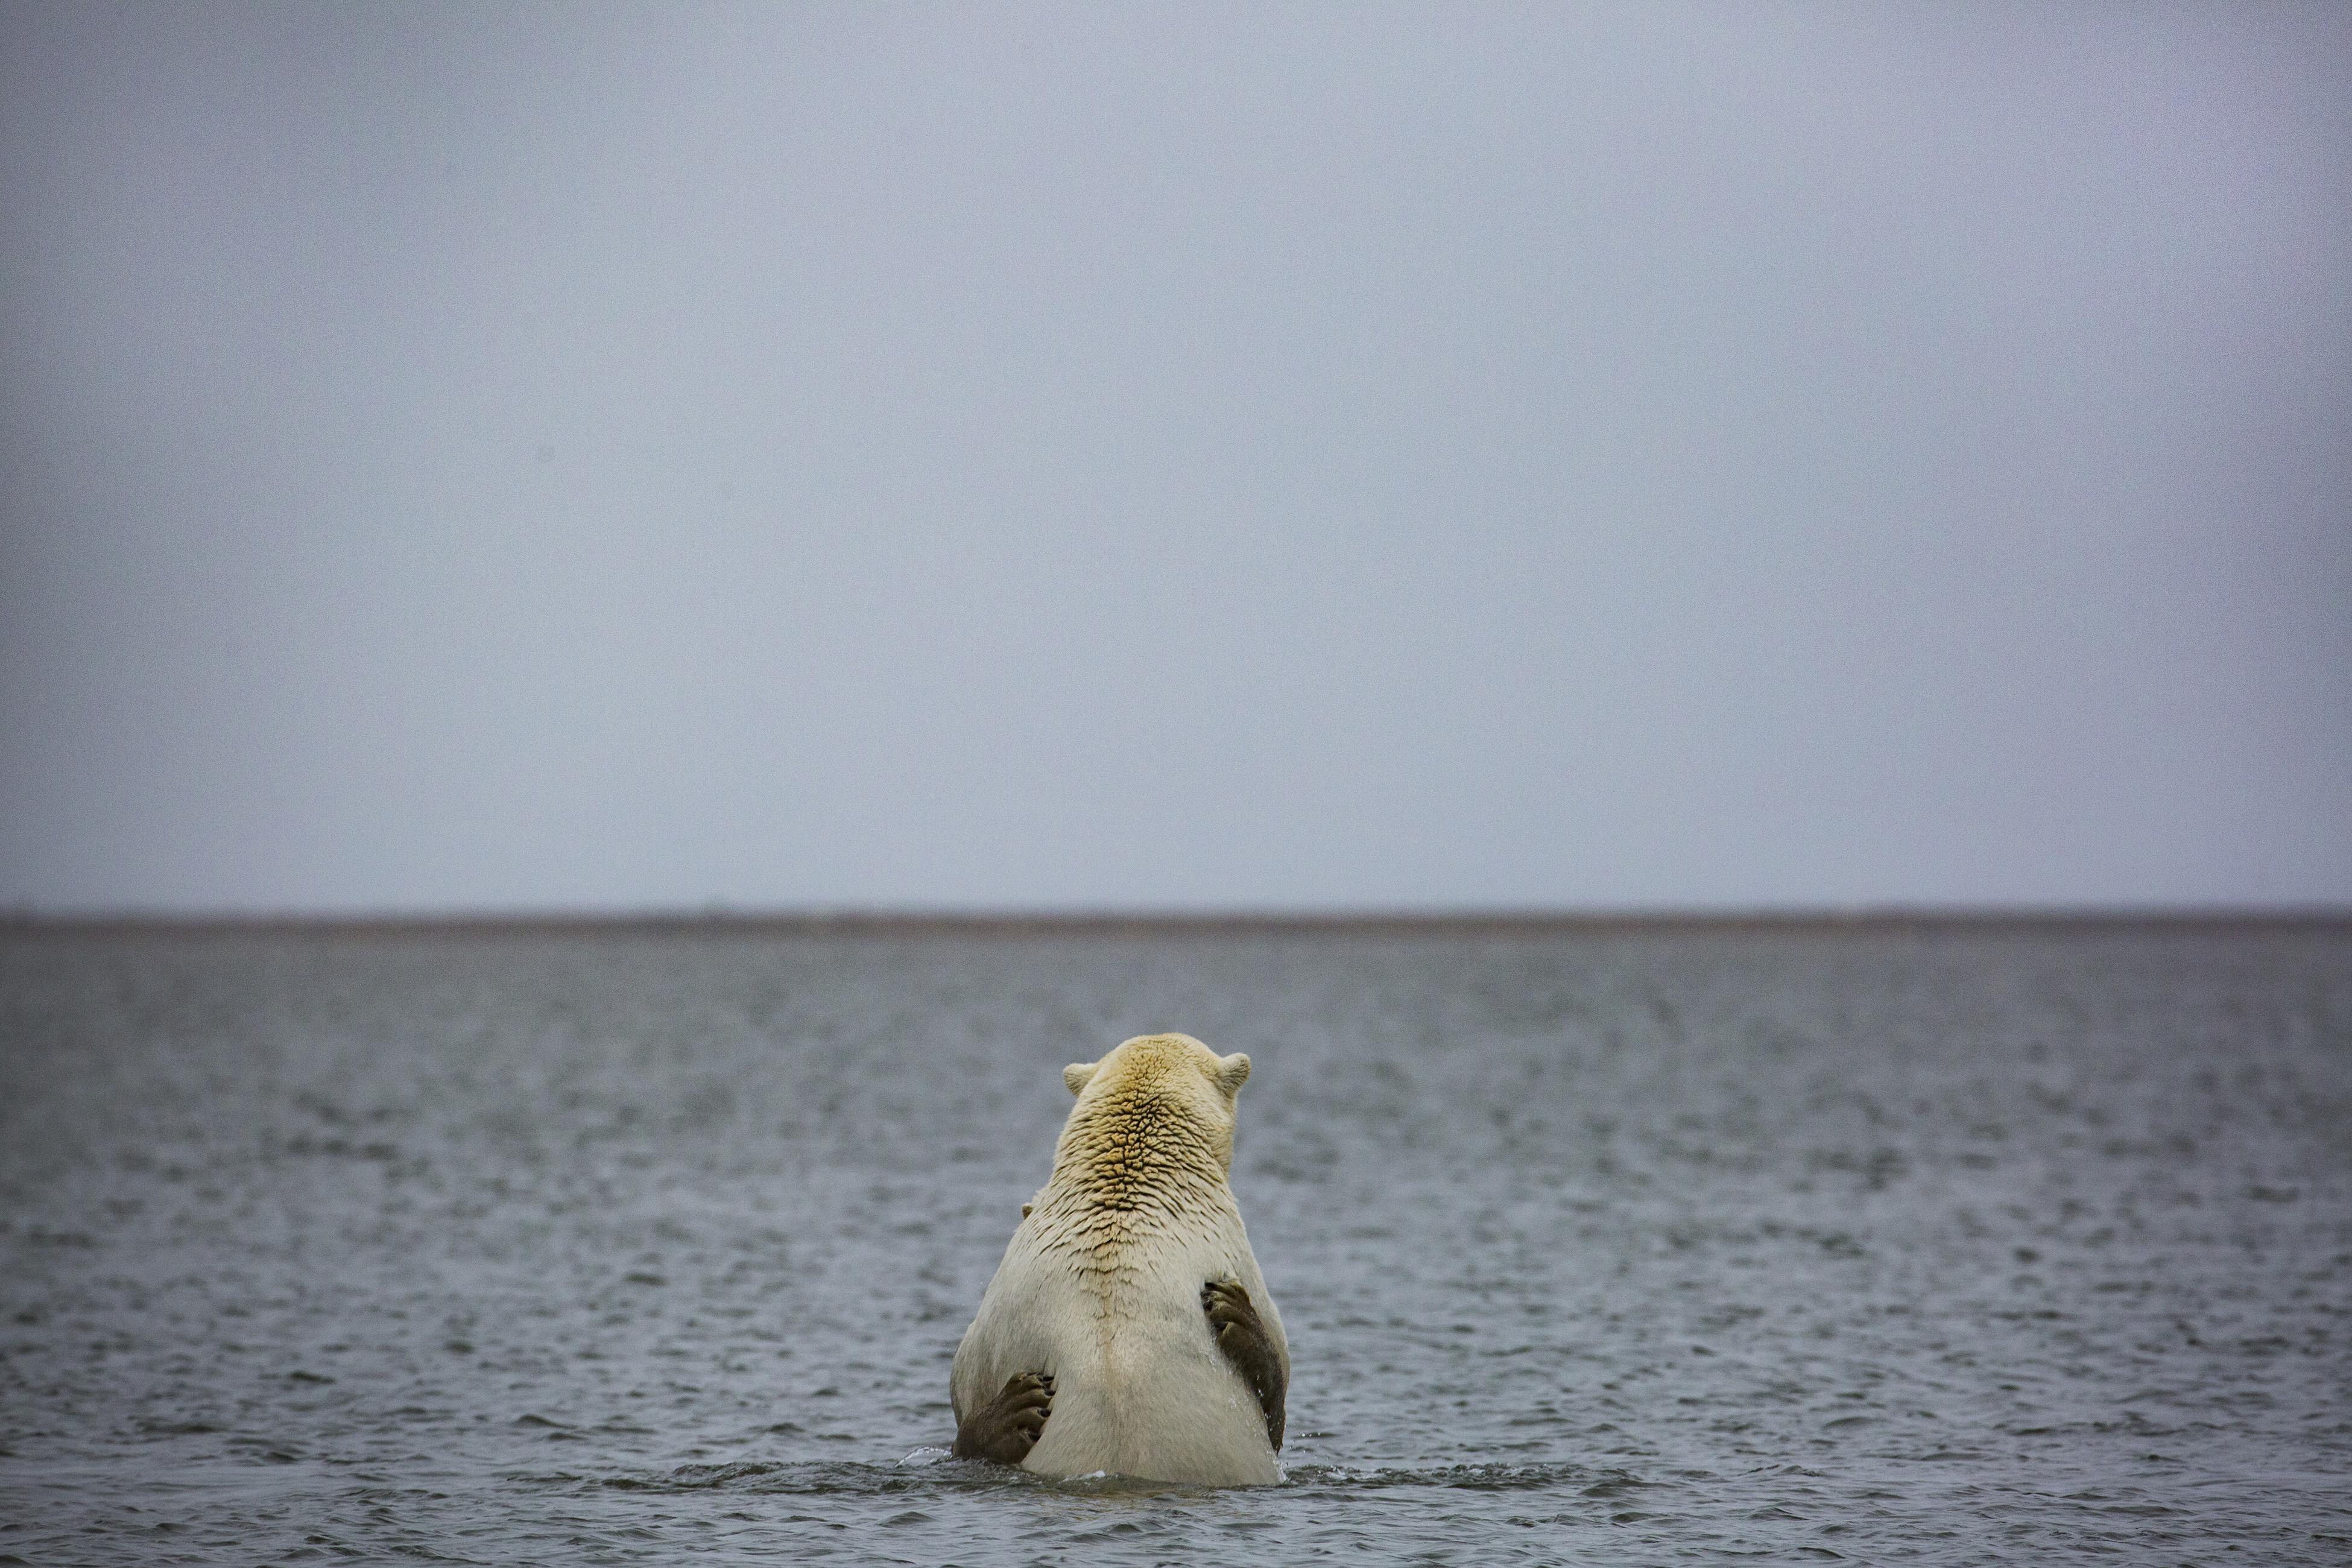 Eastern Arctic polar bears are doing OK — for now